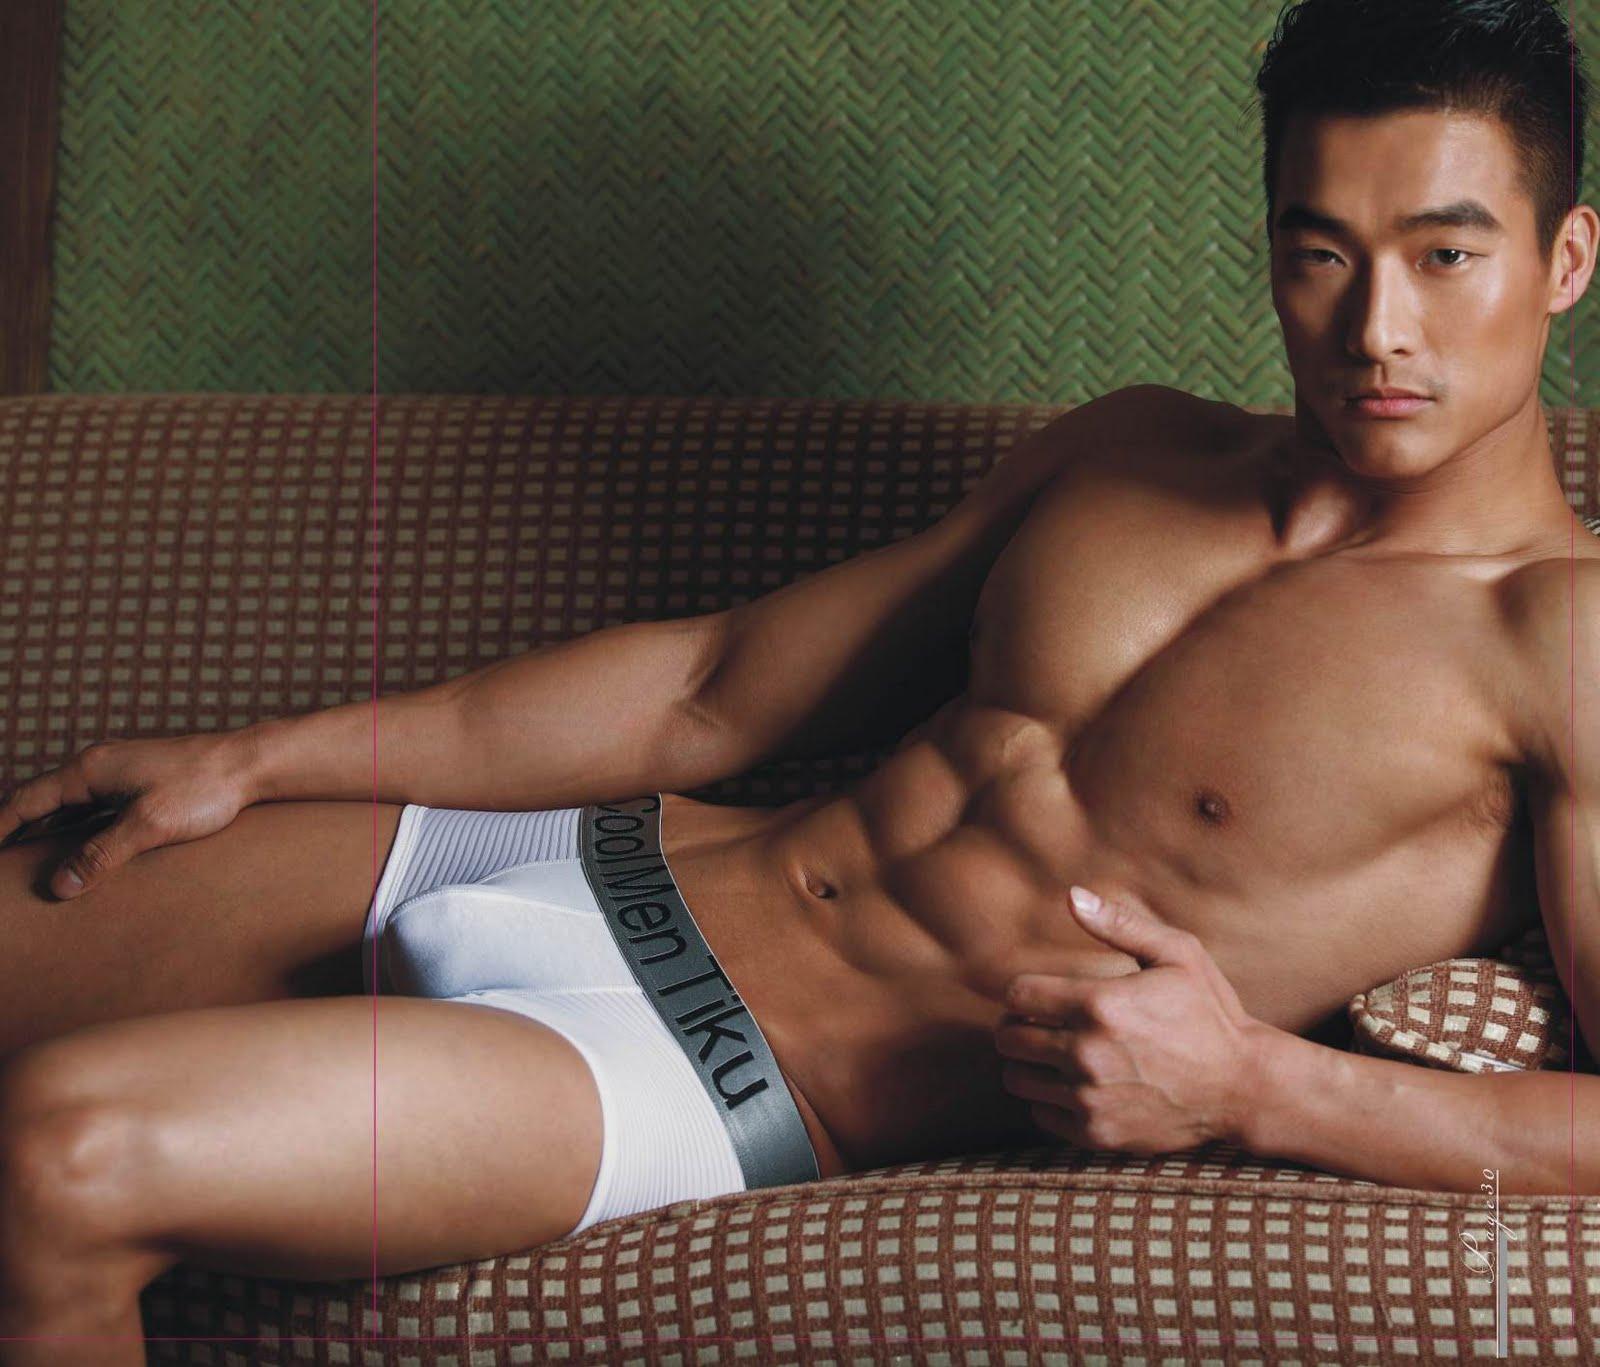 Edison chen vincy yeung